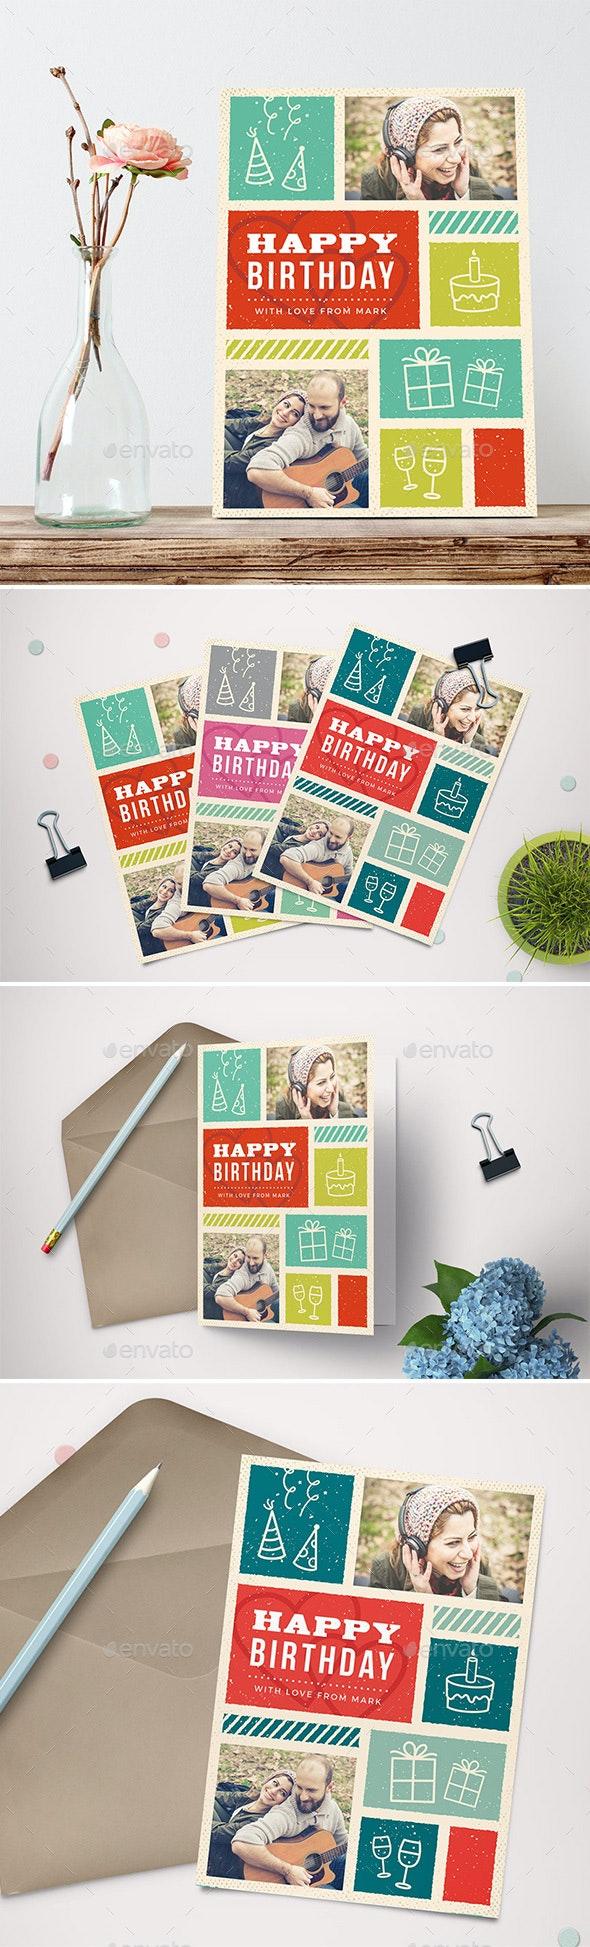 Retro Birthday Greeting Card - Birthday Greeting Cards